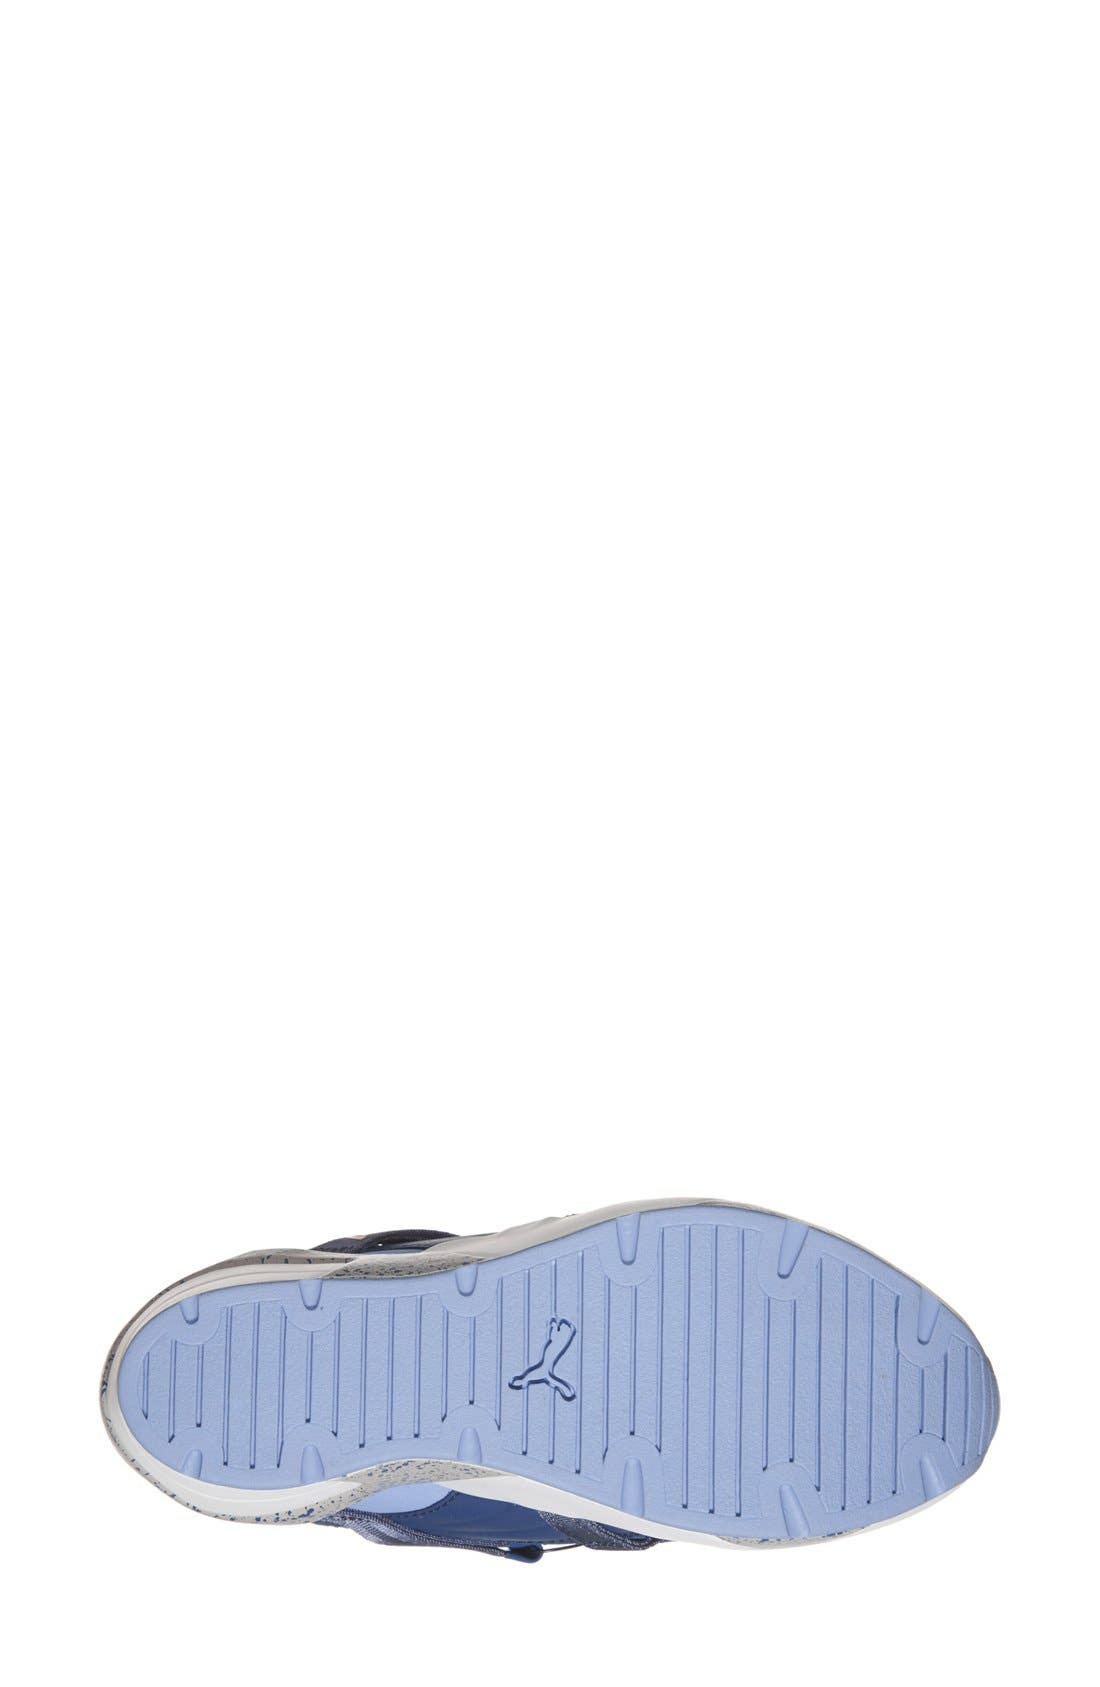 Alternate Image 4  - PUMA 'Disc Trinomic - Sophia Chang' Wedge Sneaker (Women)